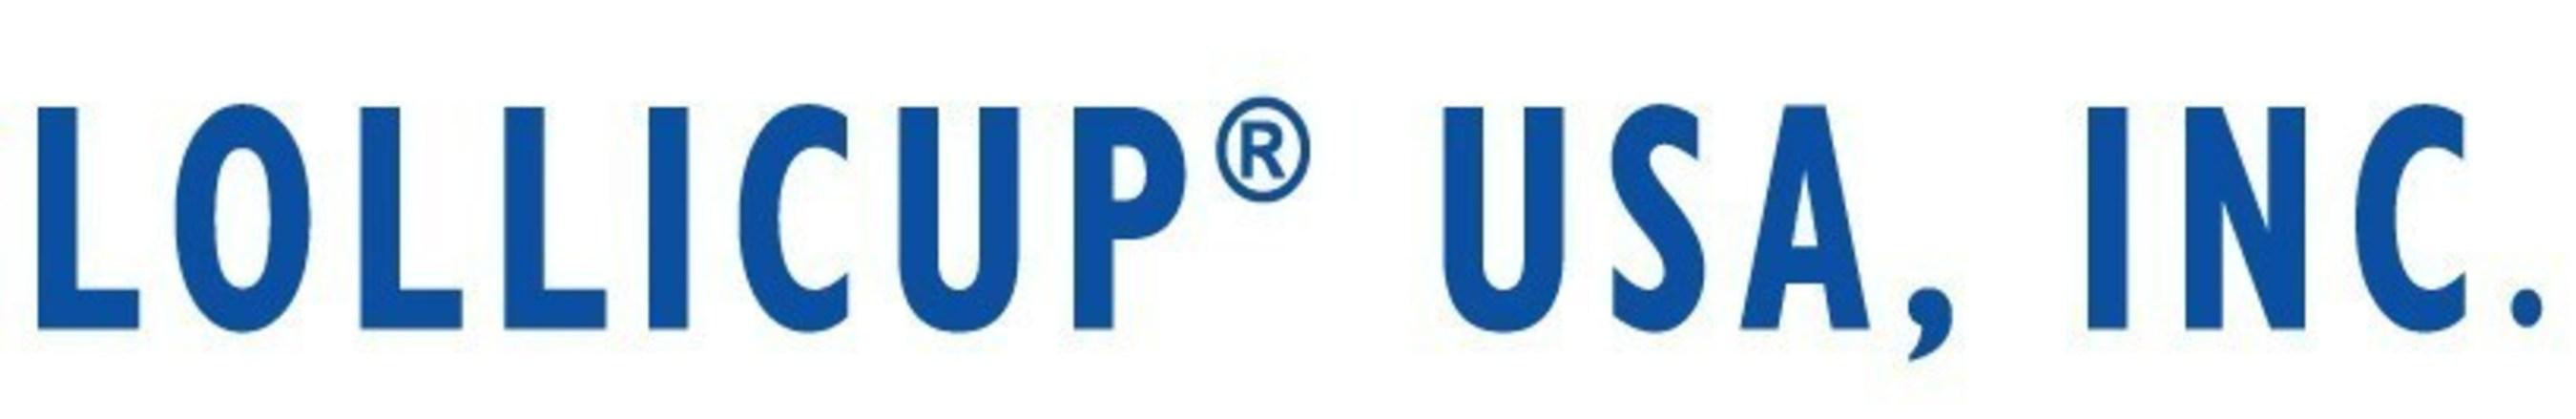 Lollicup USA, Inc. logo